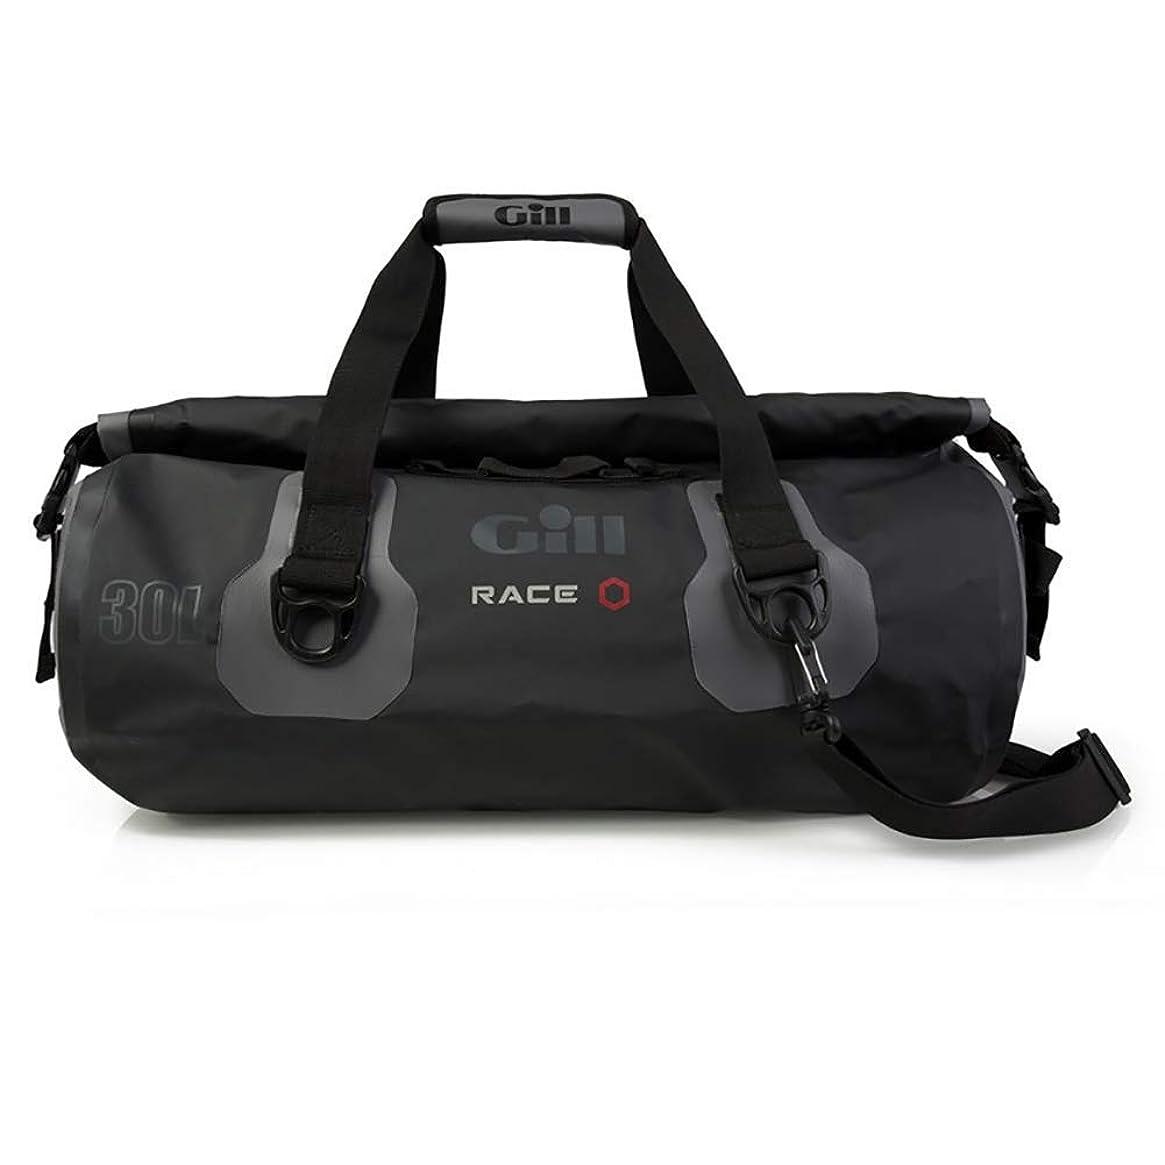 Gill 30L Convertible Race Team Bag